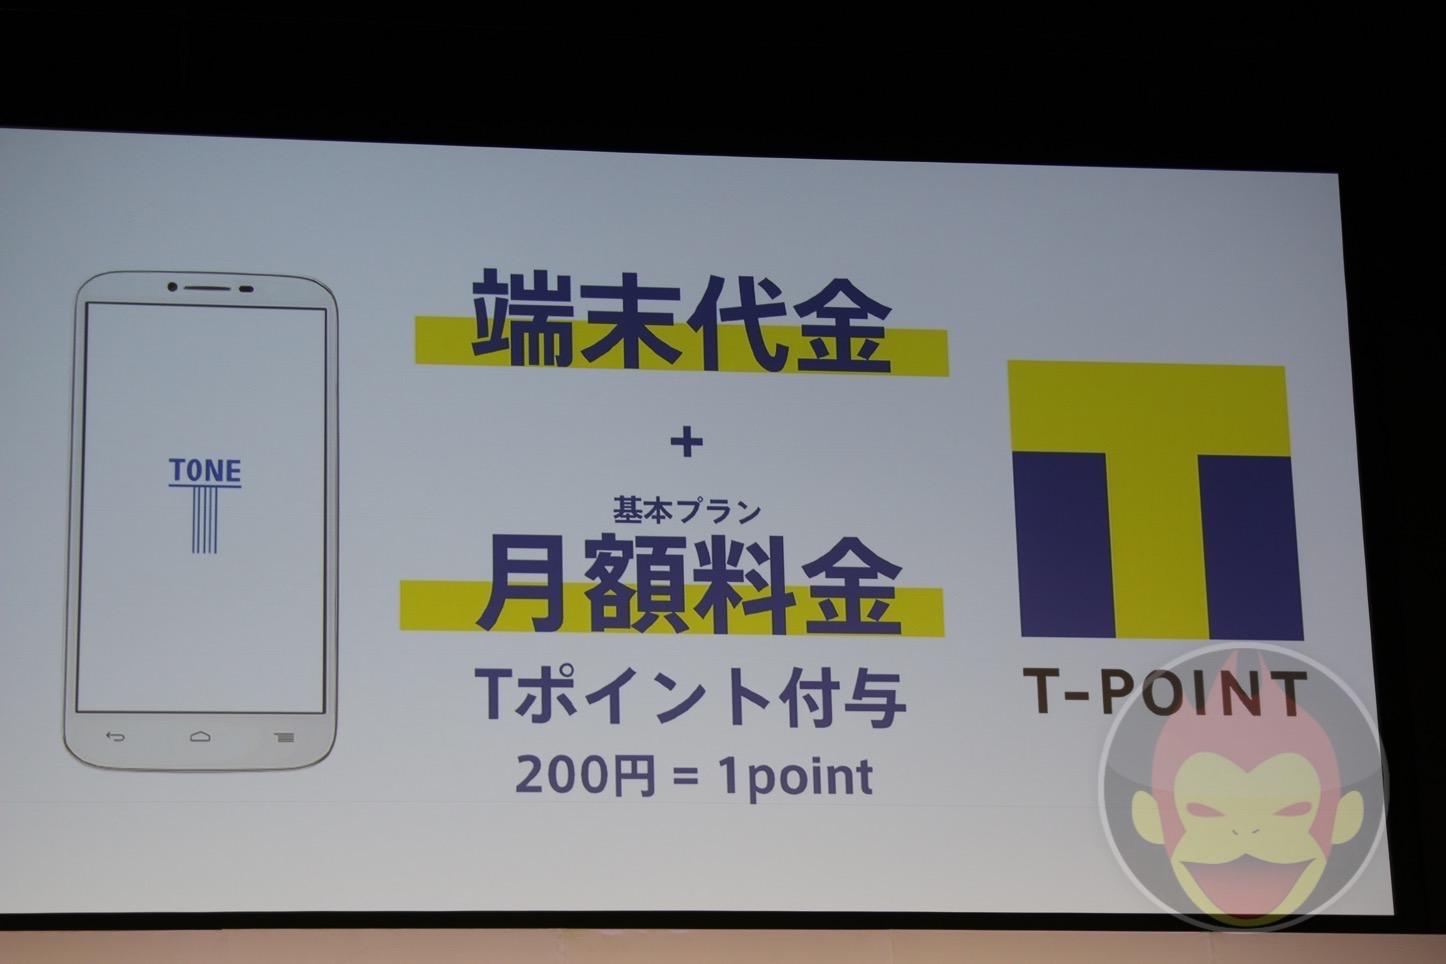 Tone-Mobile-11.JPG